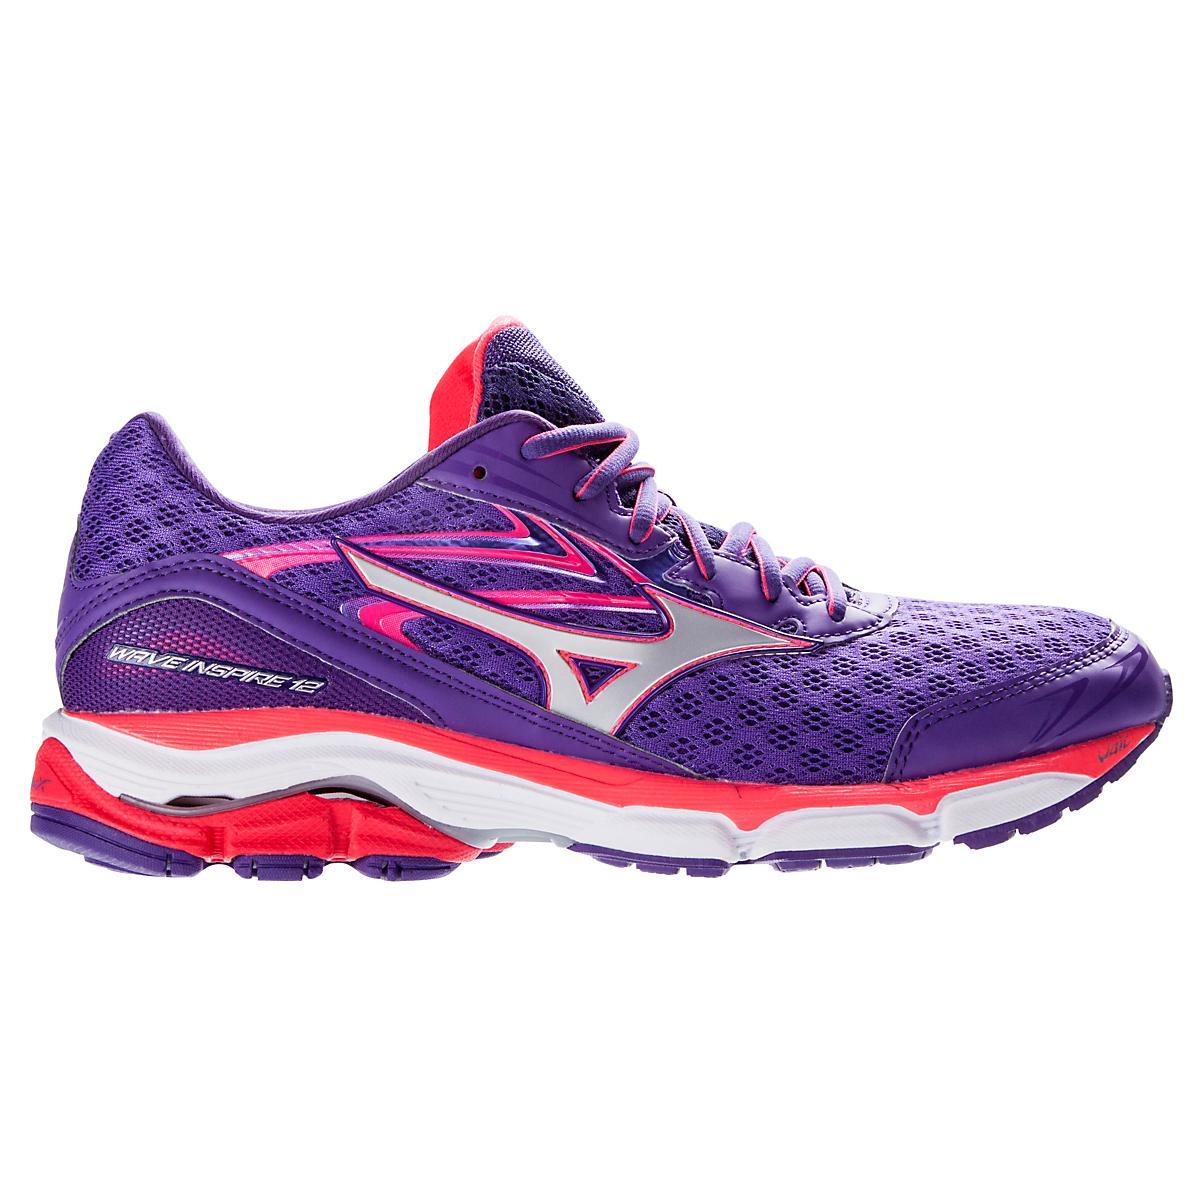 08f96fafbf1 Womens Mizuno Wave Inspire 12 Running Shoe at Road Runner Sports